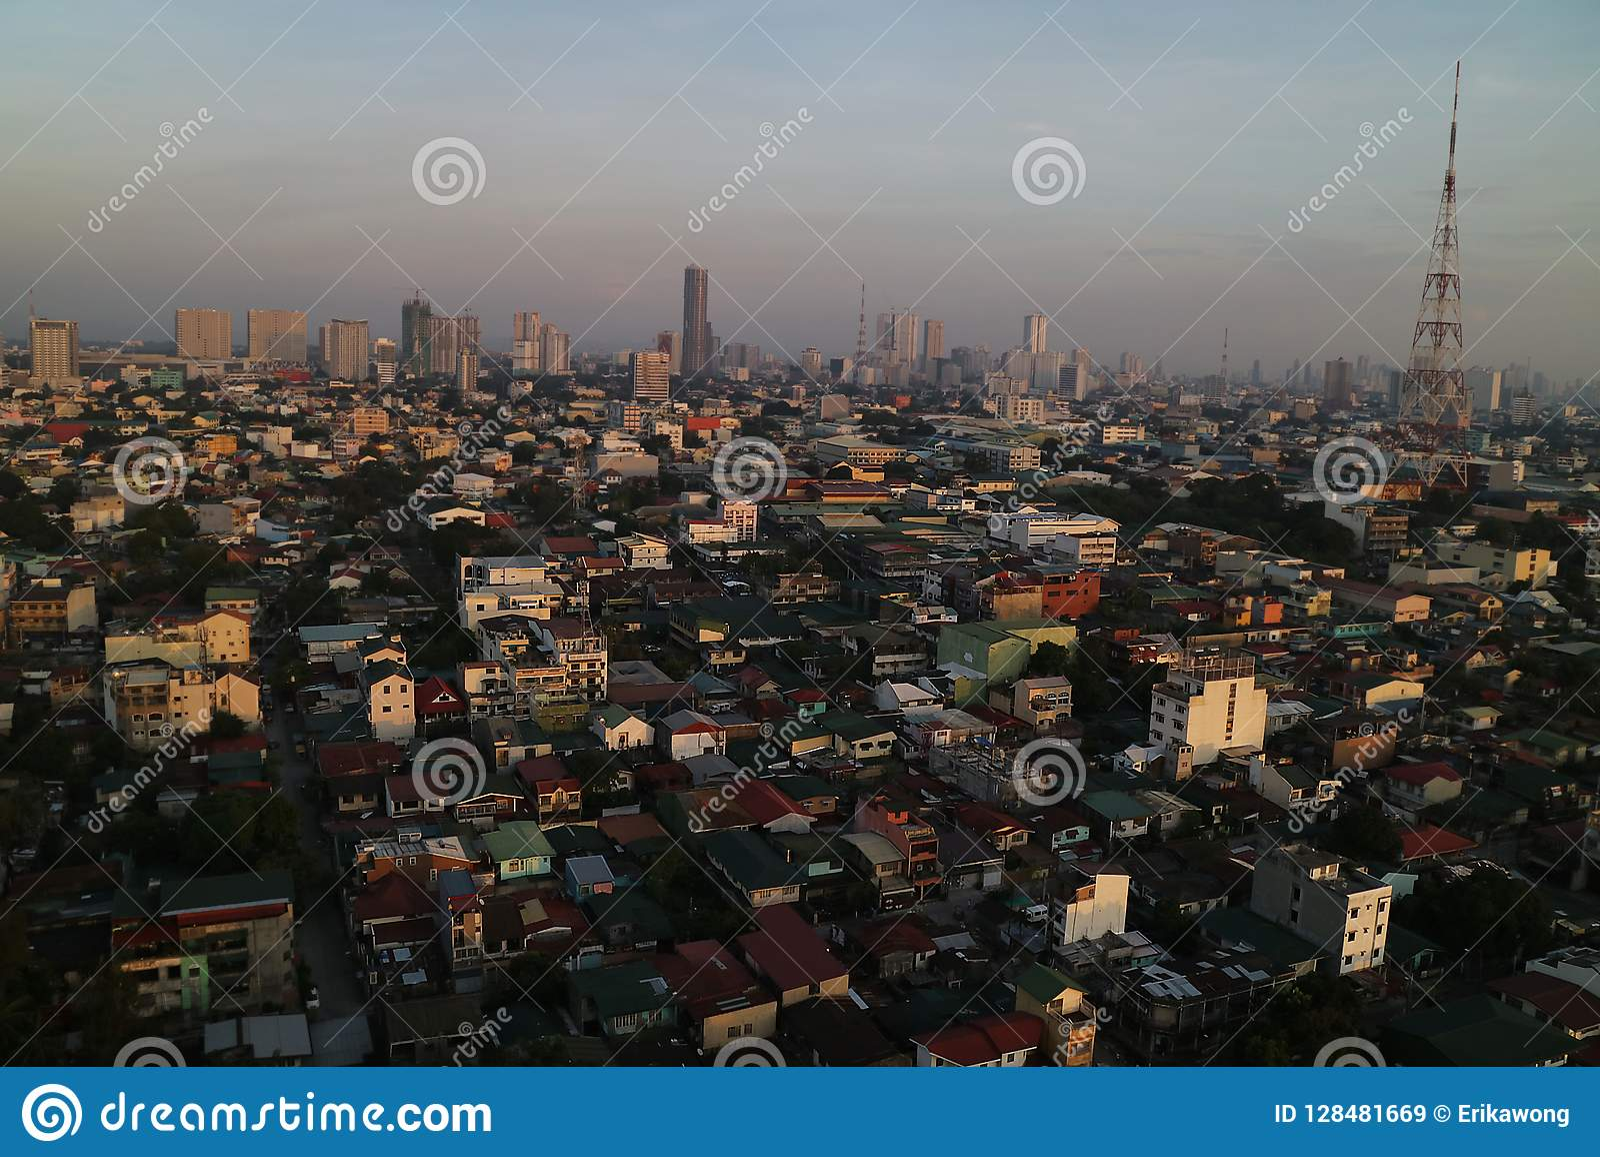 Manila, Philippines skyline sunset view